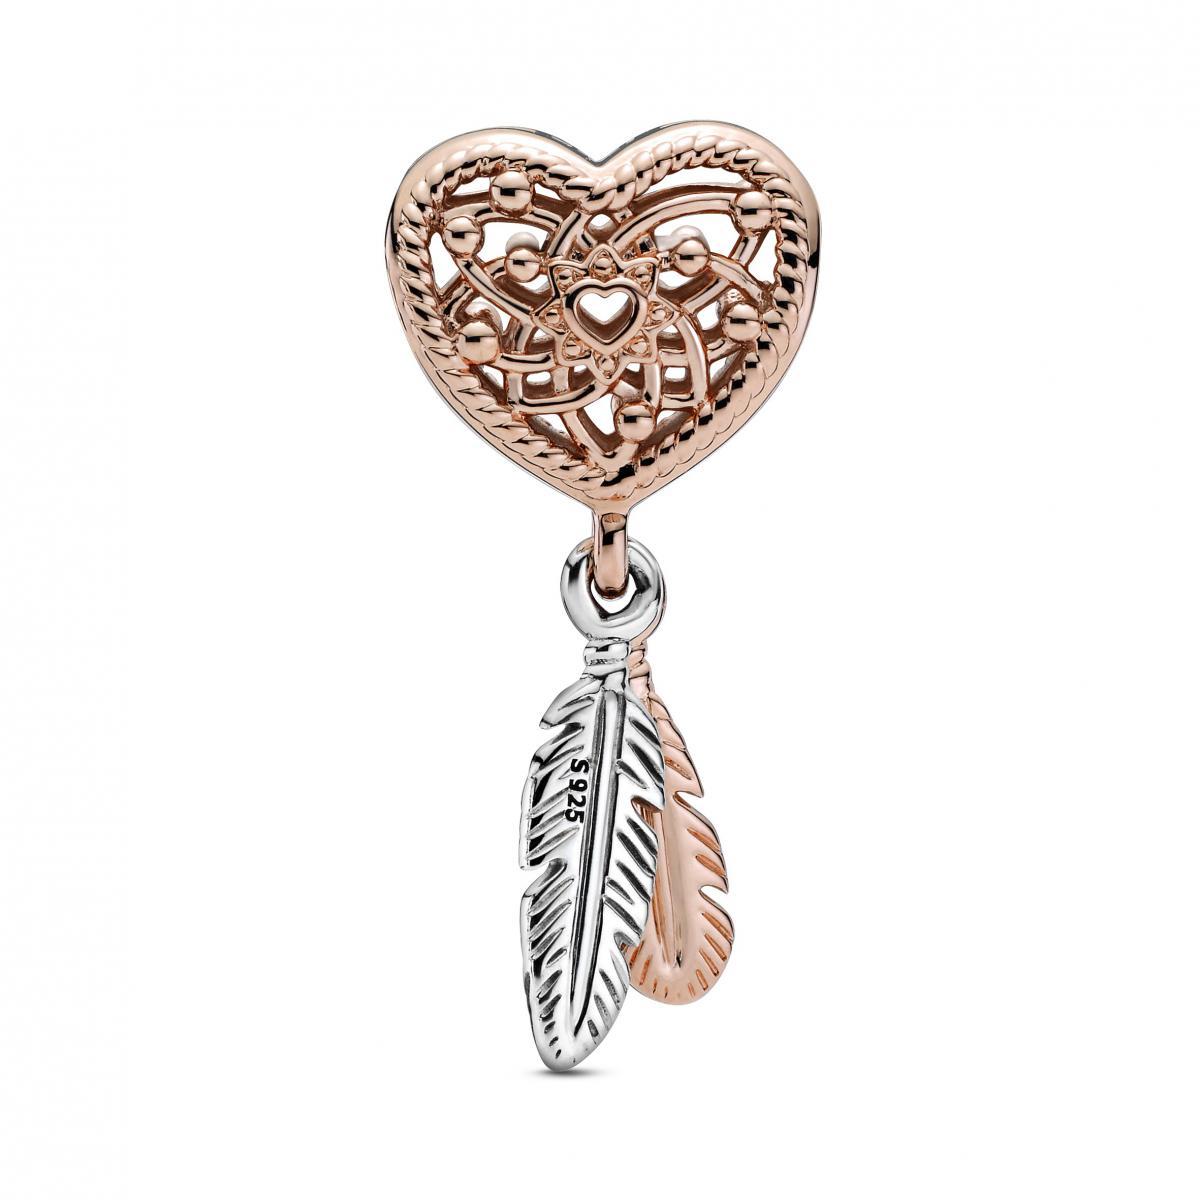 Charms et perles Pandora Bijoux 789068C00 - Pandora Passions